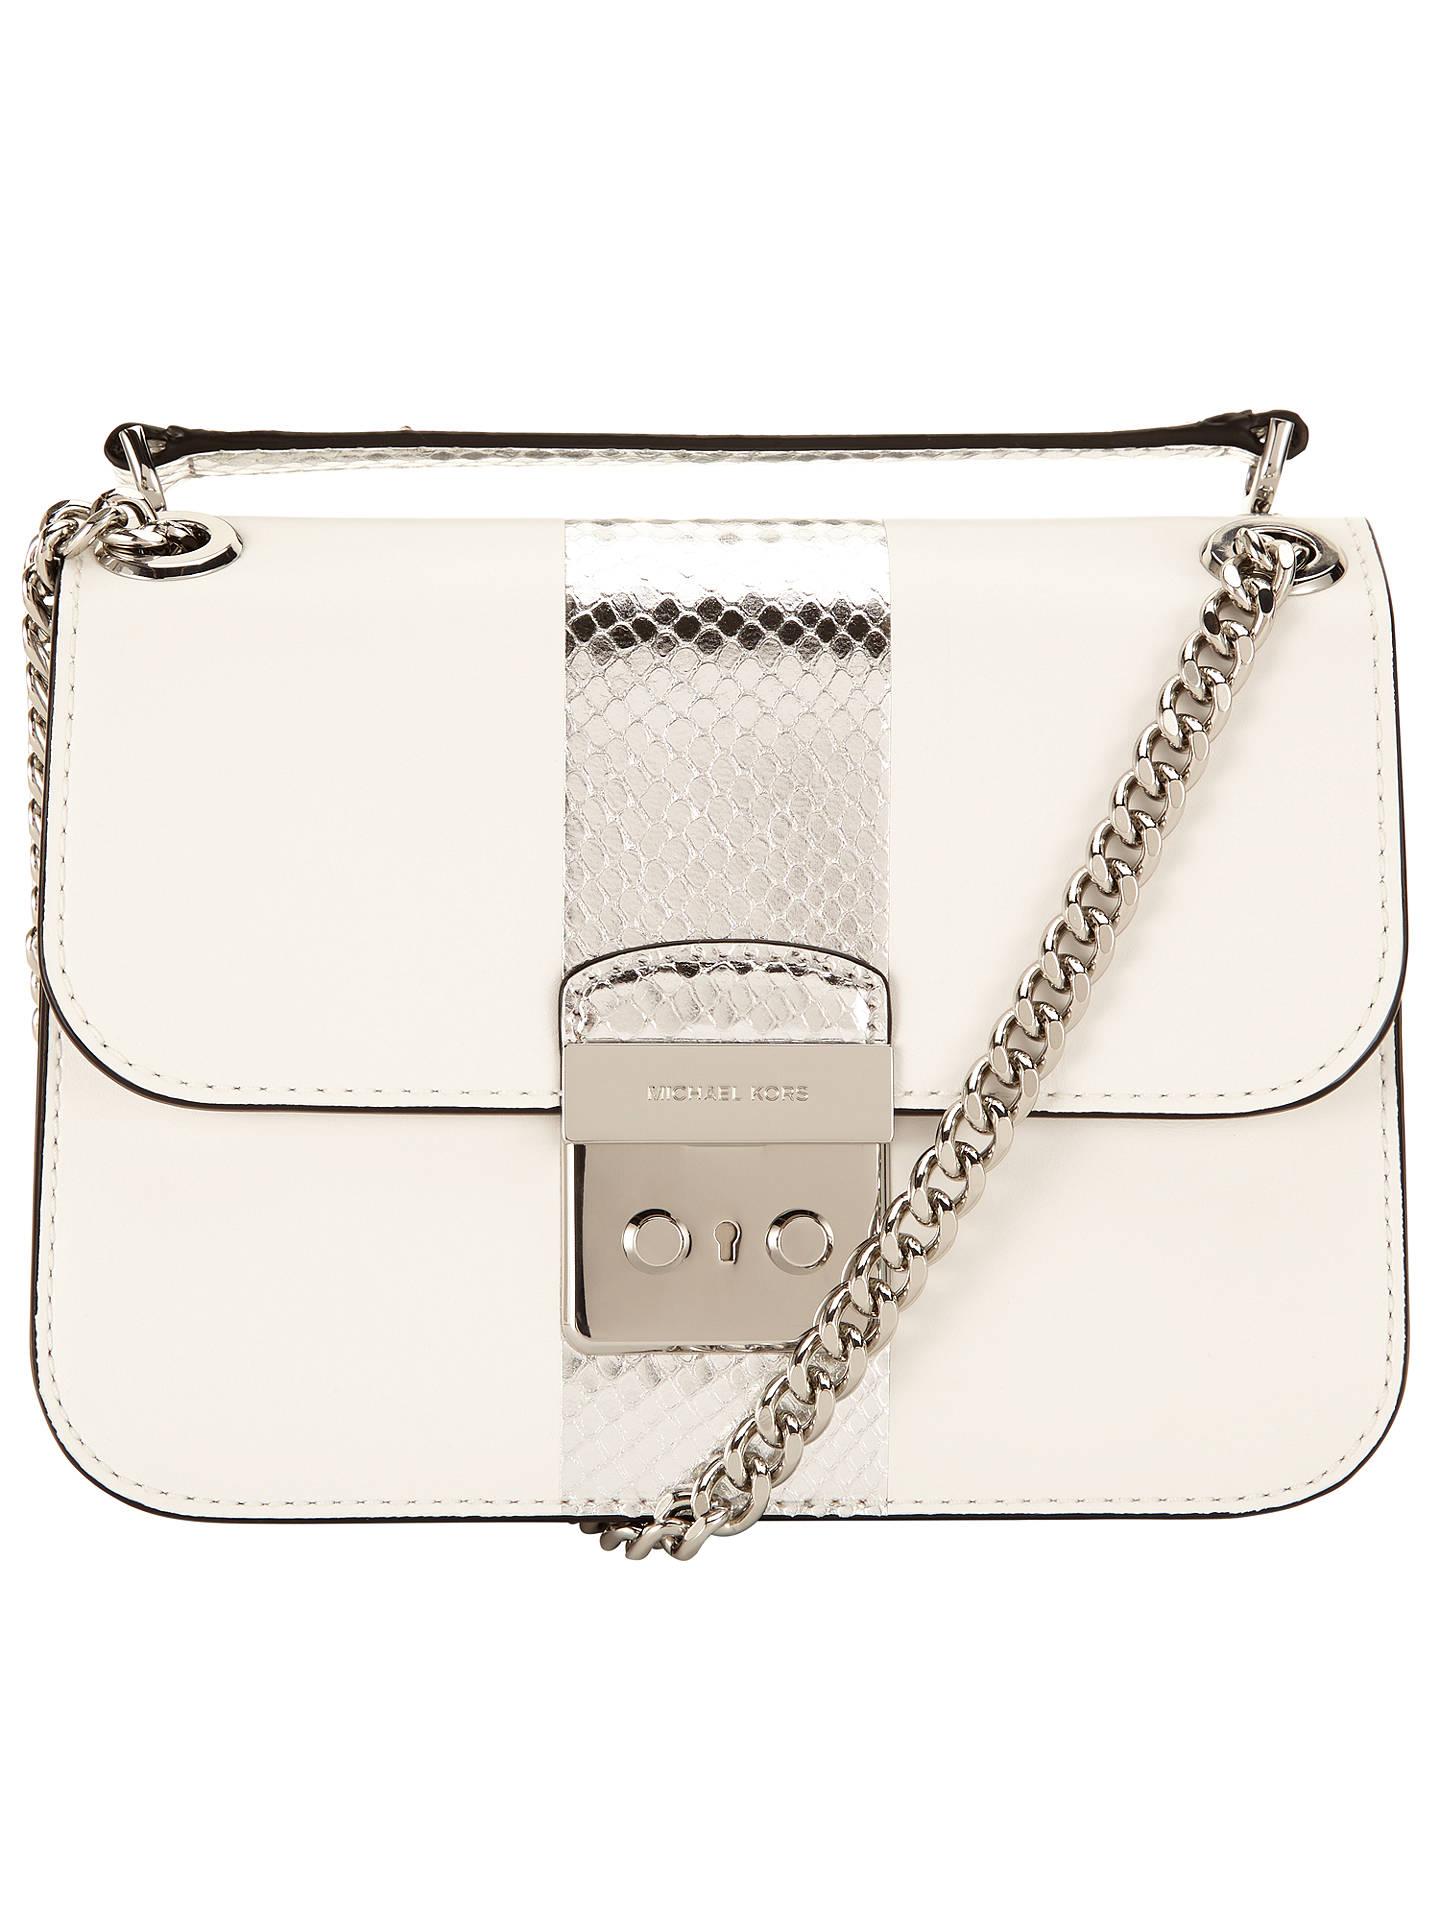 b685d303c32152 Buy MICHAEL Michael Kors Sloan Editor Medium Leather Chain Shoulder Bag,  Optic White Online at ...